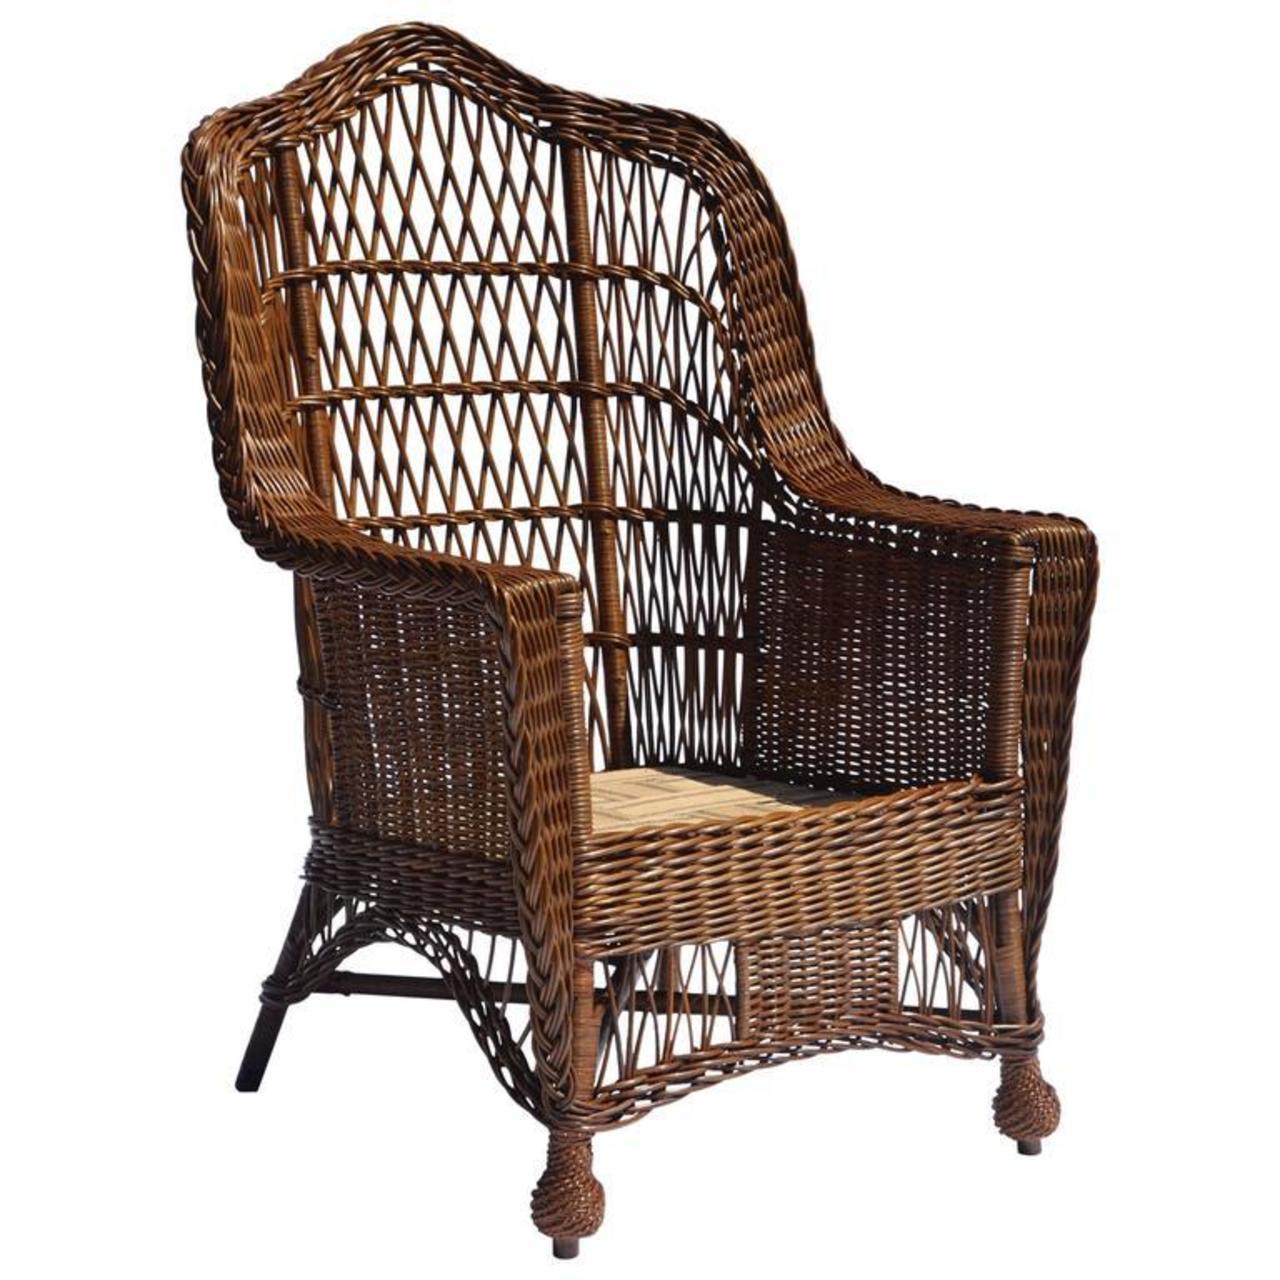 Antique Heywood-Wakefield Wicker Armchair - The Wicker Shop